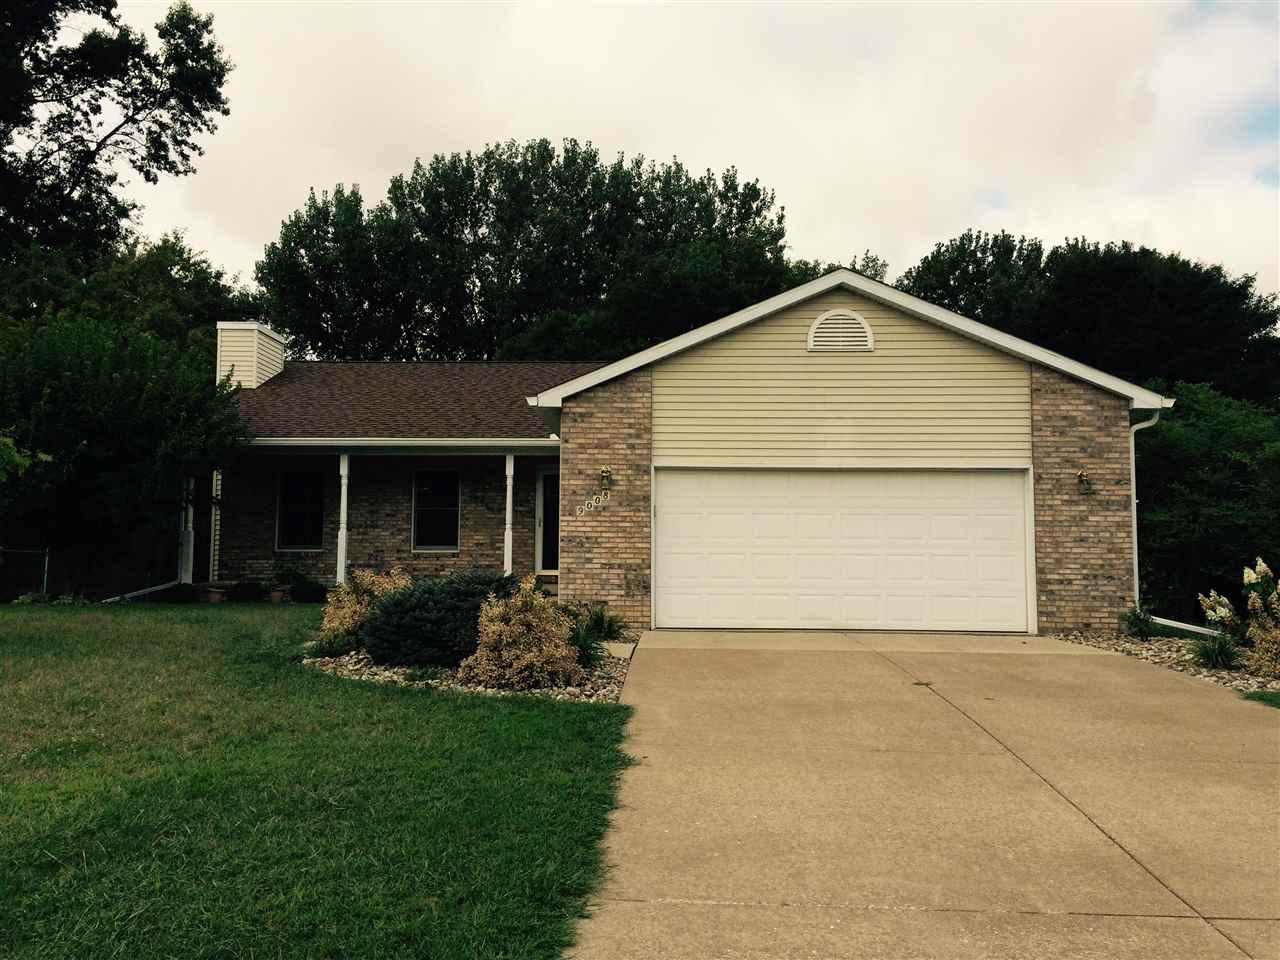 Rental Homes for Rent, ListingId:35062331, location: 9008 33RD ST W Rock Island 61201